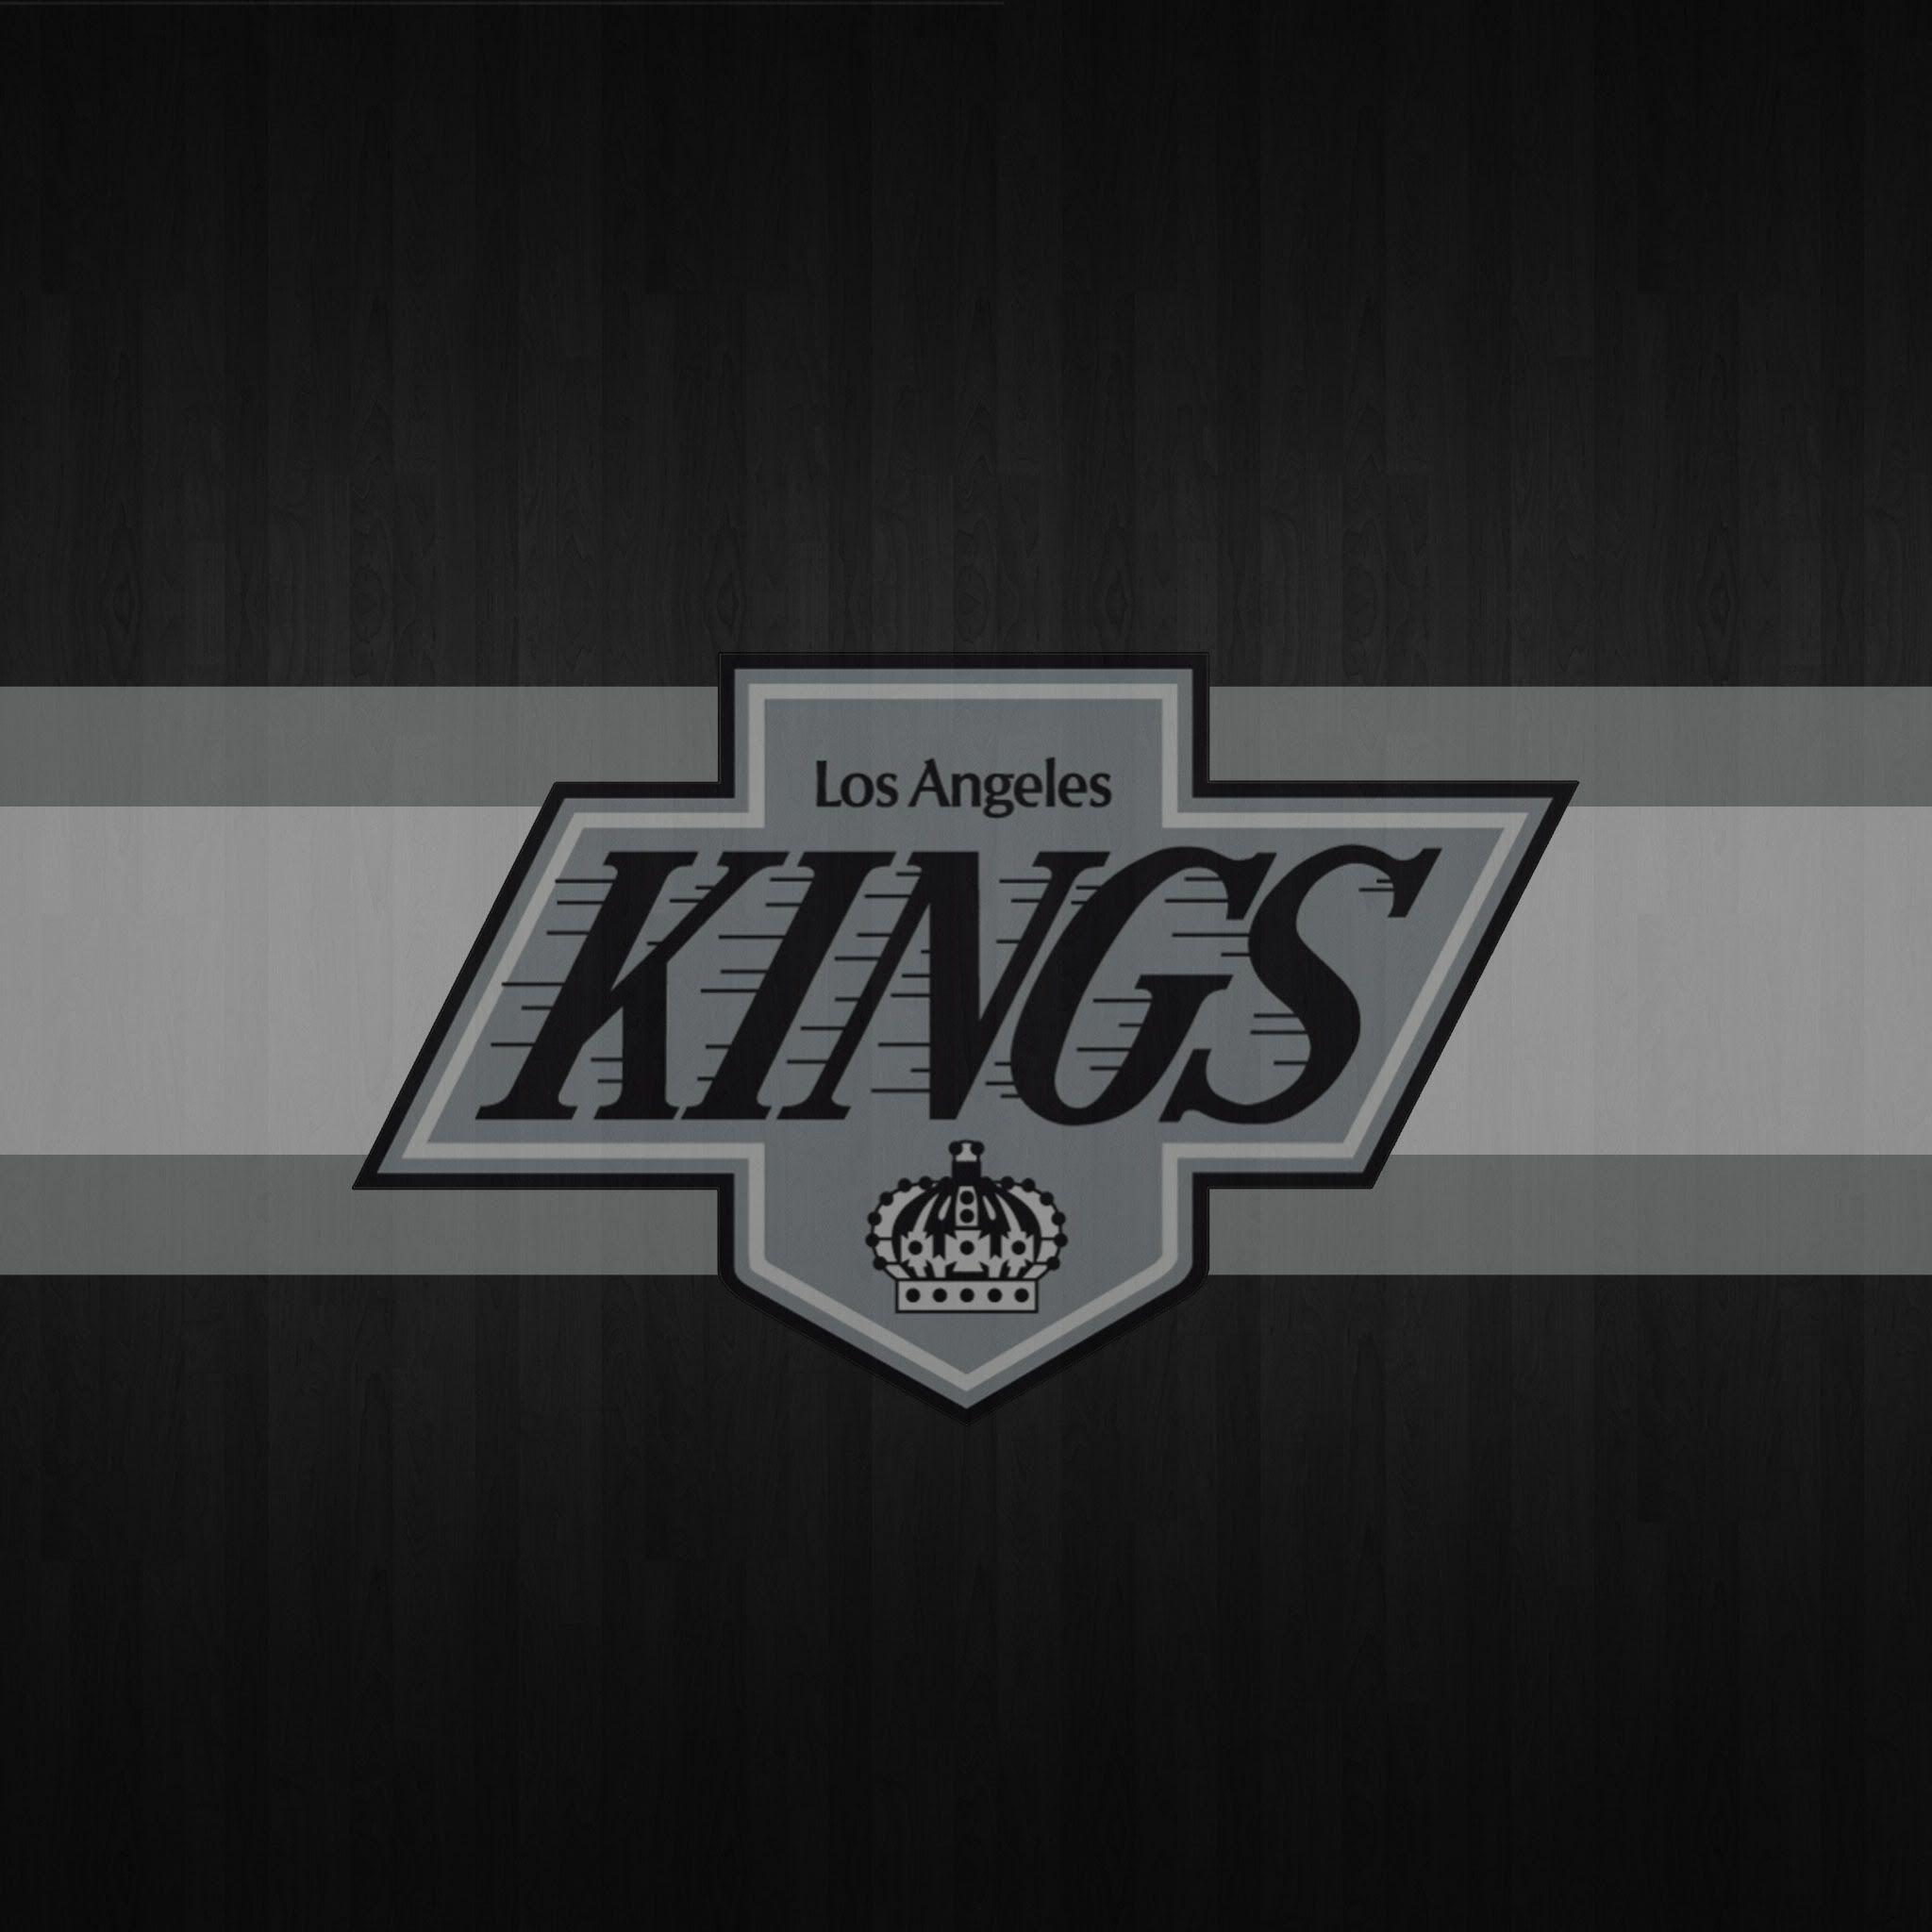 la kings wallpapers wallpaper cave